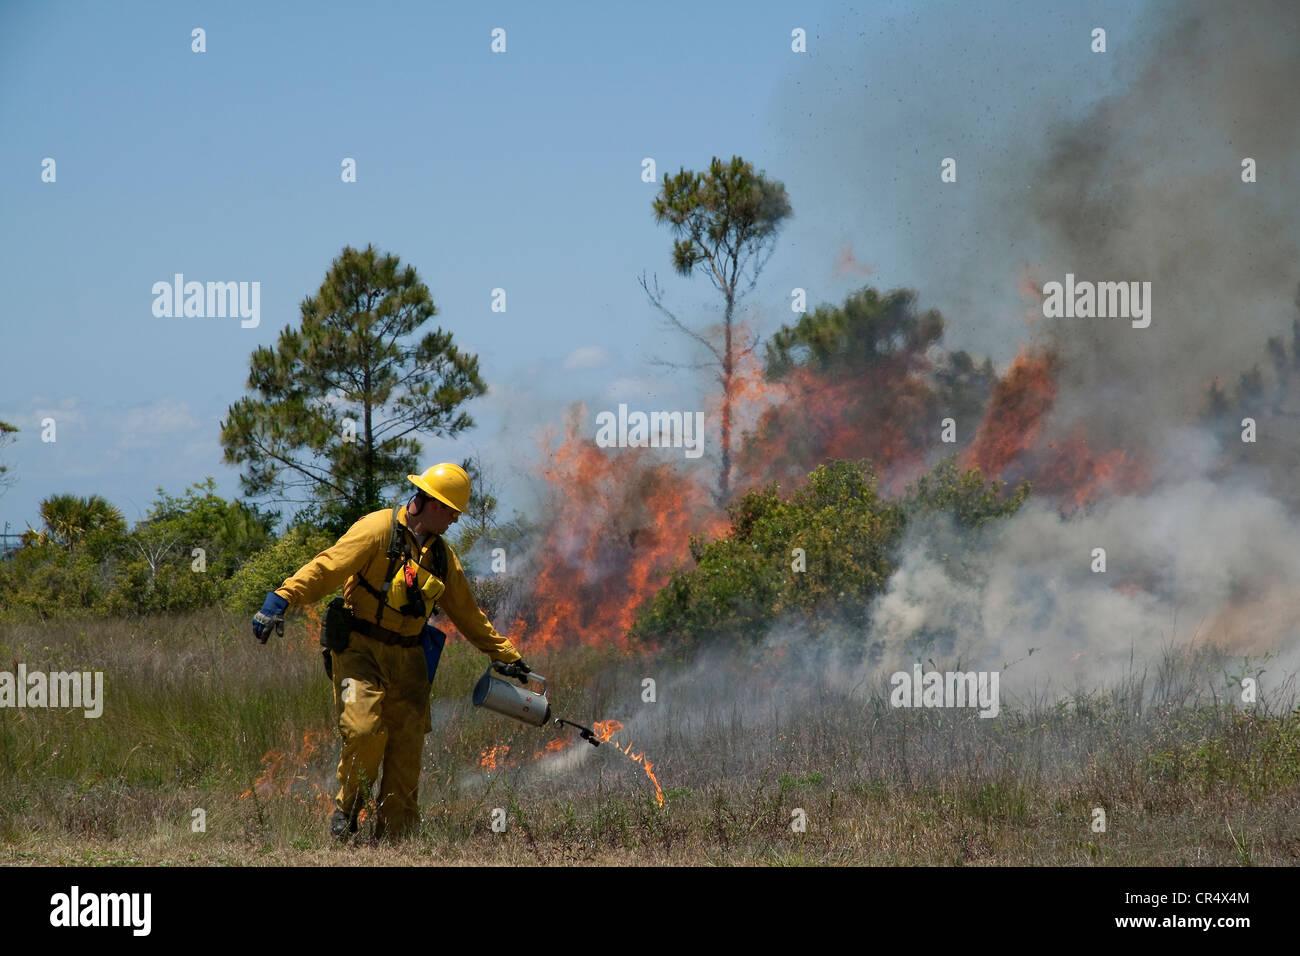 Forester lighting Slash Pine forest Pinus elliottii on fire, controlled burn, Florida USA - Stock Image